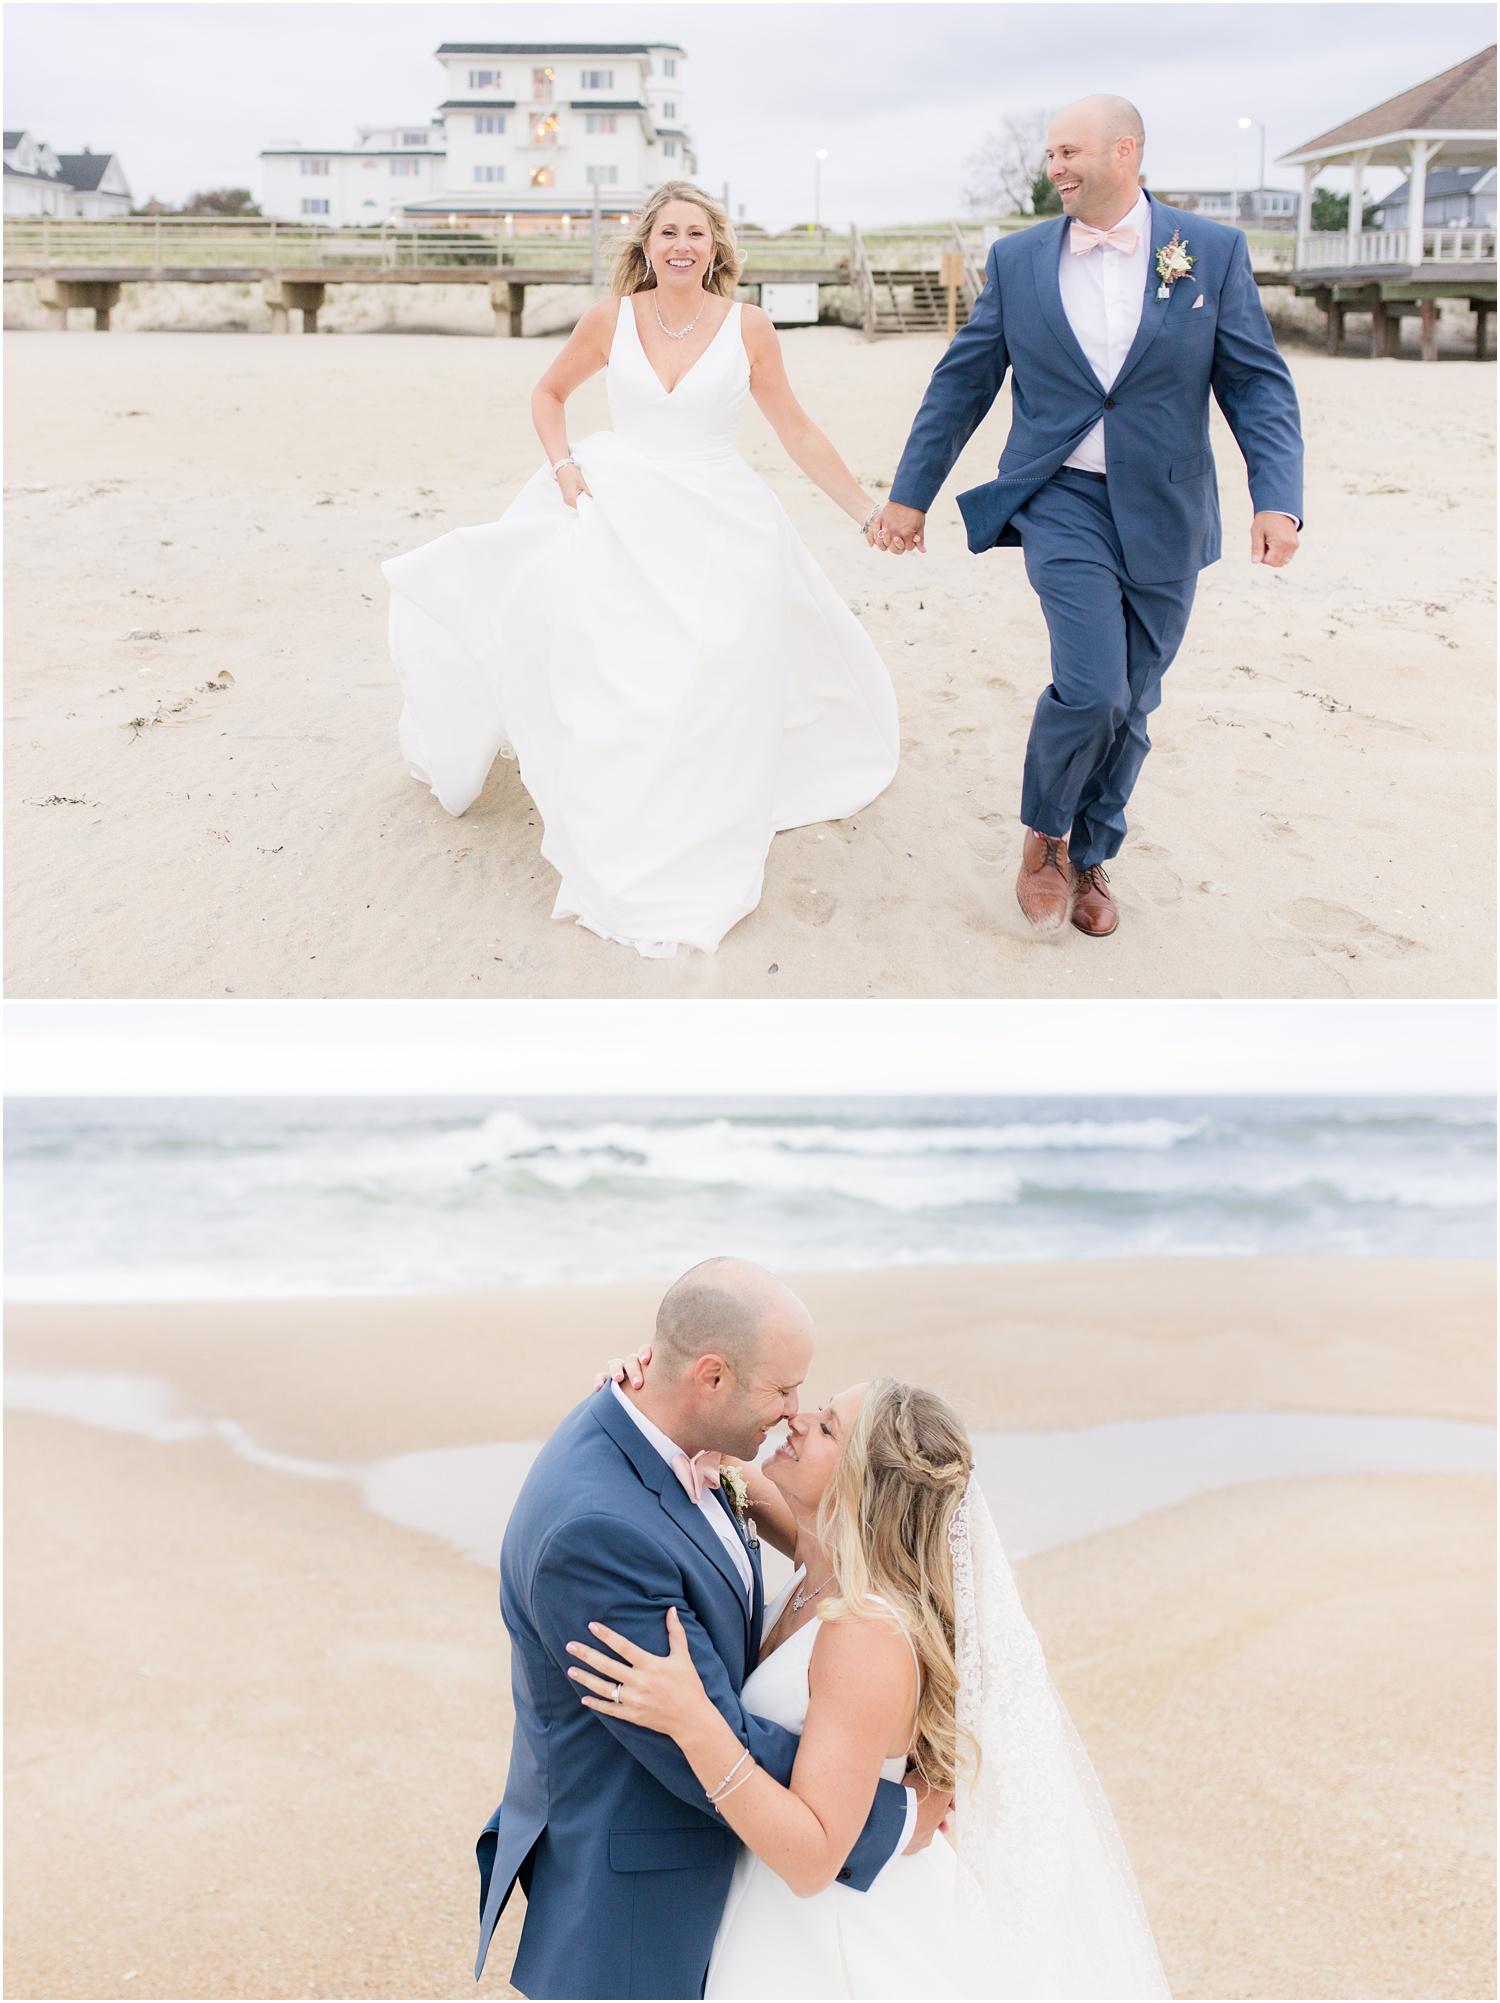 Fun wedding photos on the beach in Spring Lake, NJ.